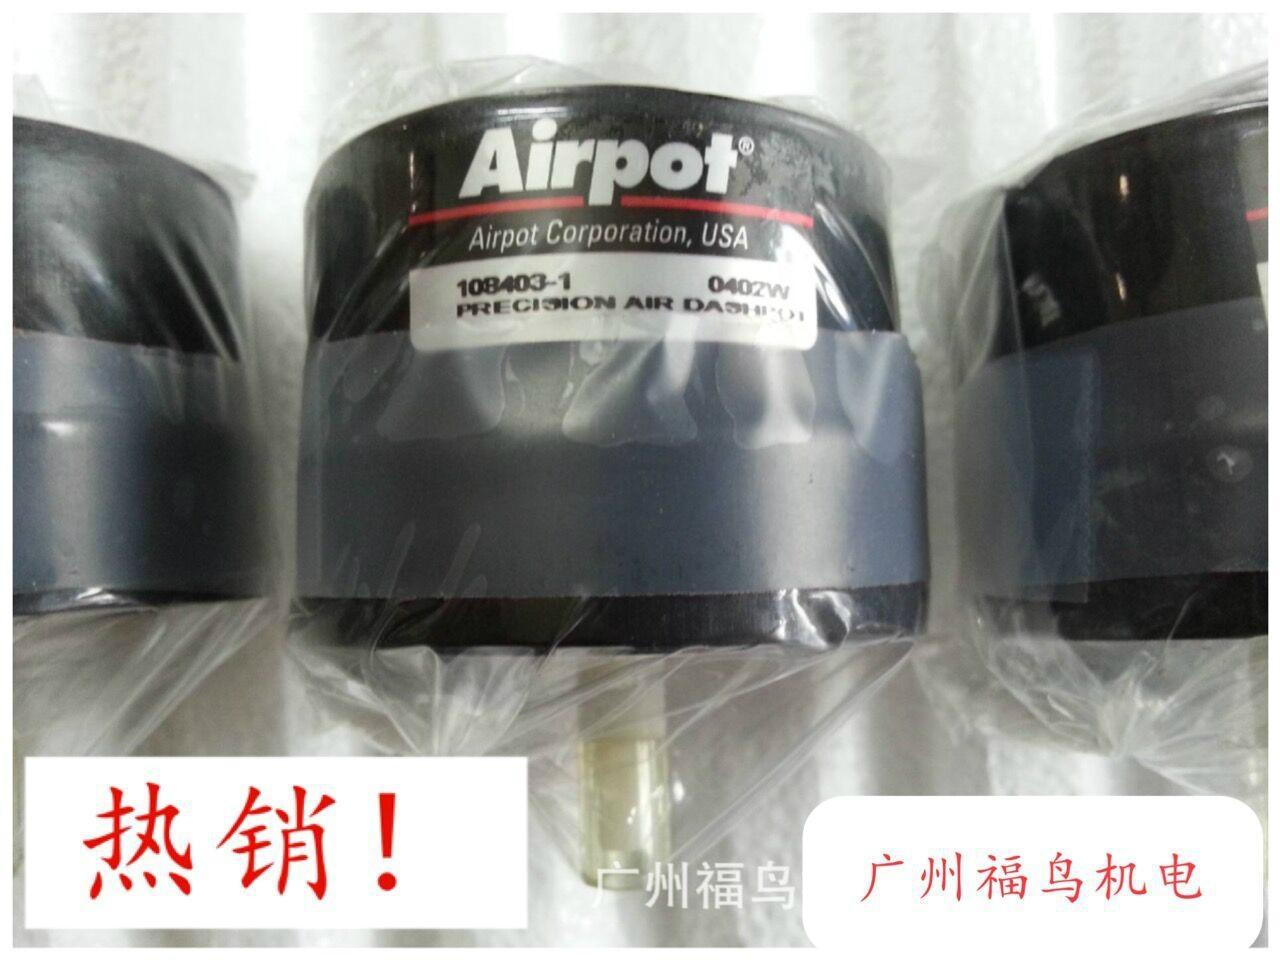 AIRPOT气缸,  型号: 108403-1